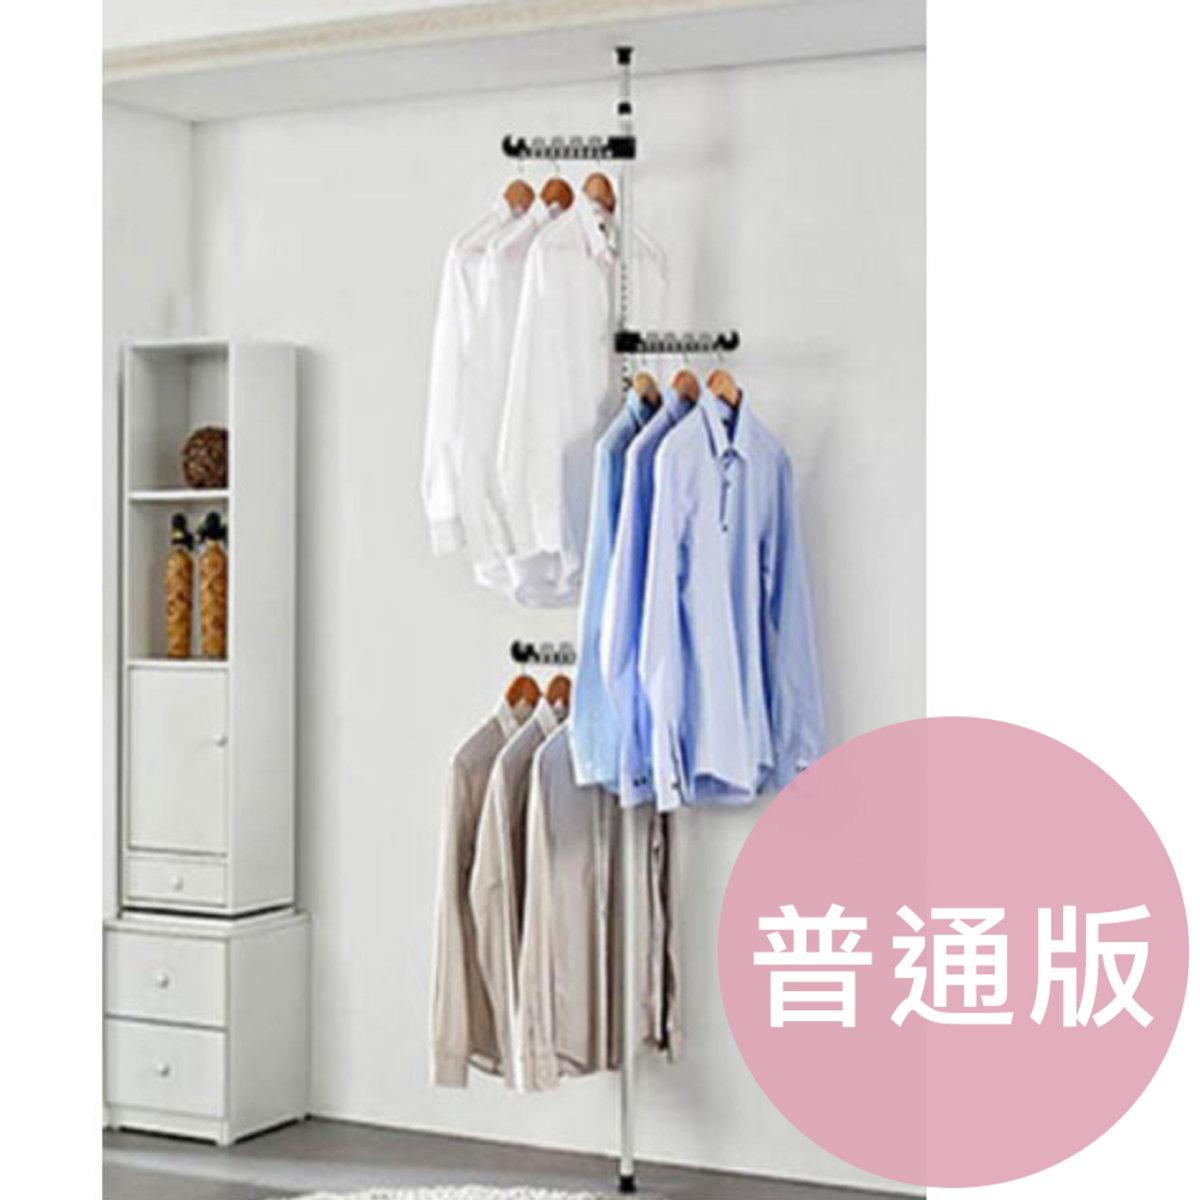 Floor Ceiling Pole Shelves